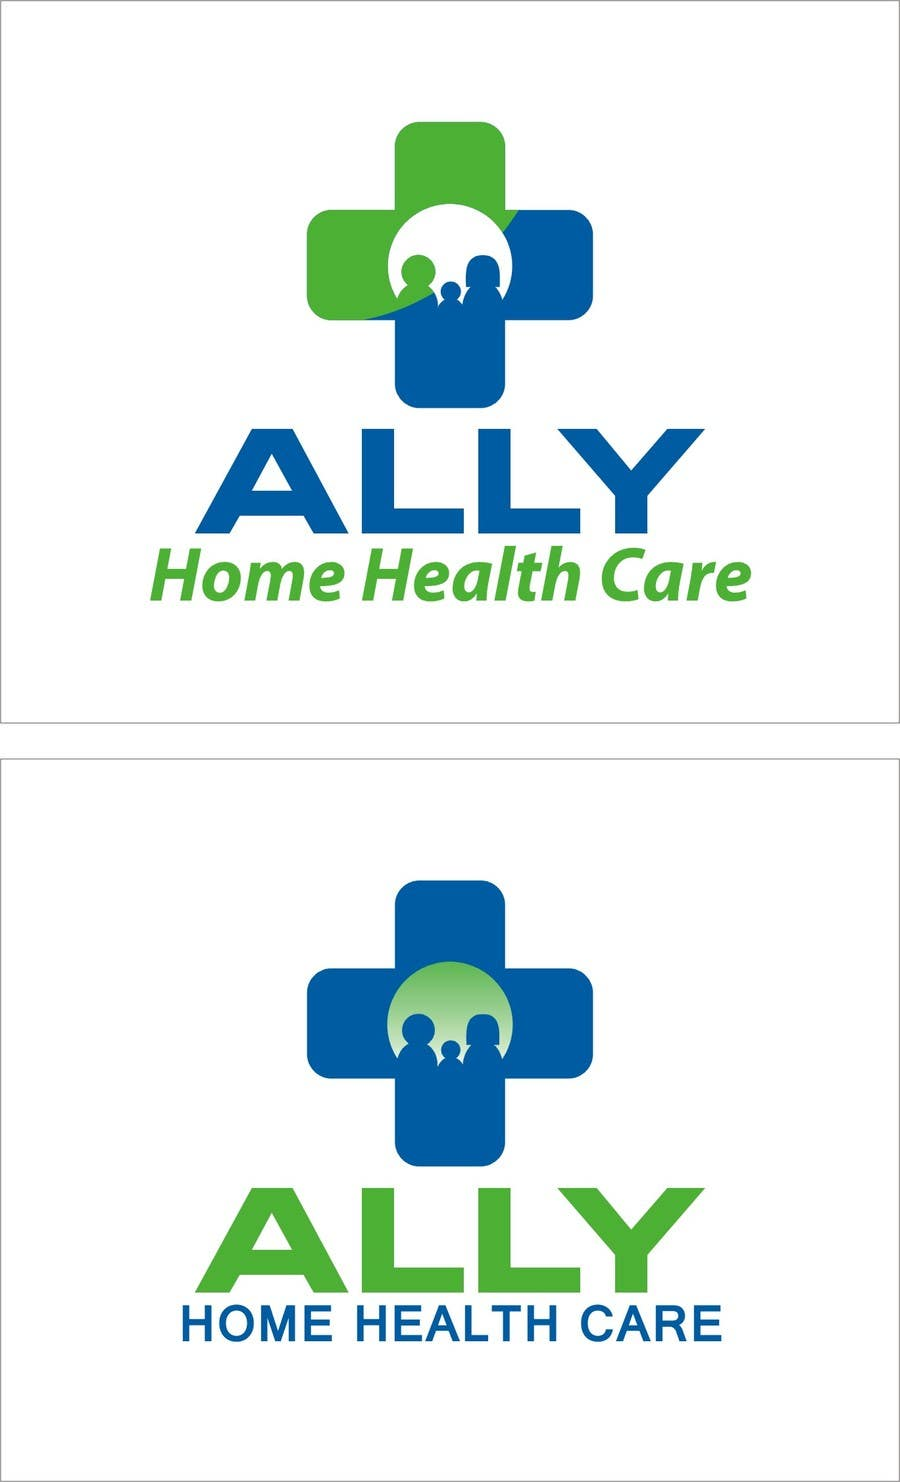 Bài tham dự cuộc thi #105 cho Design a Logo for Home Health Care Company